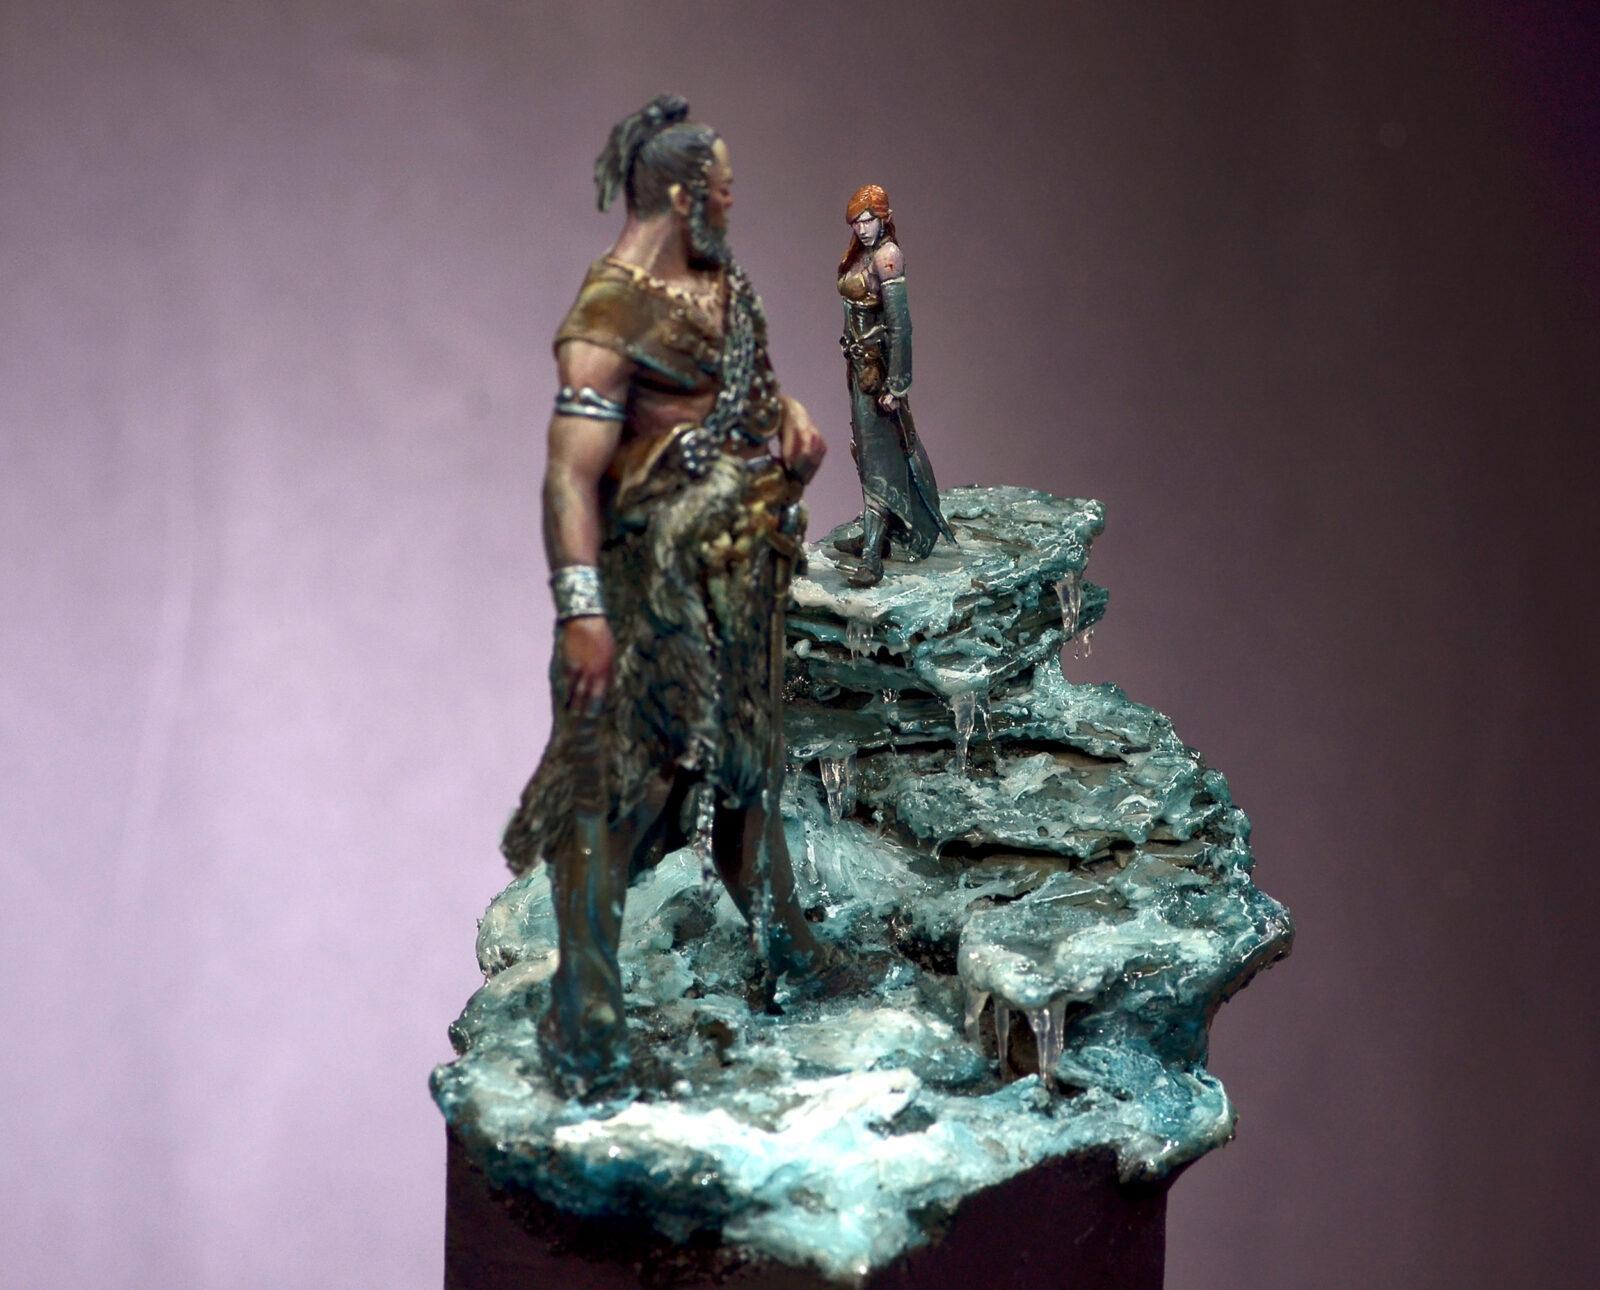 David Goliath05